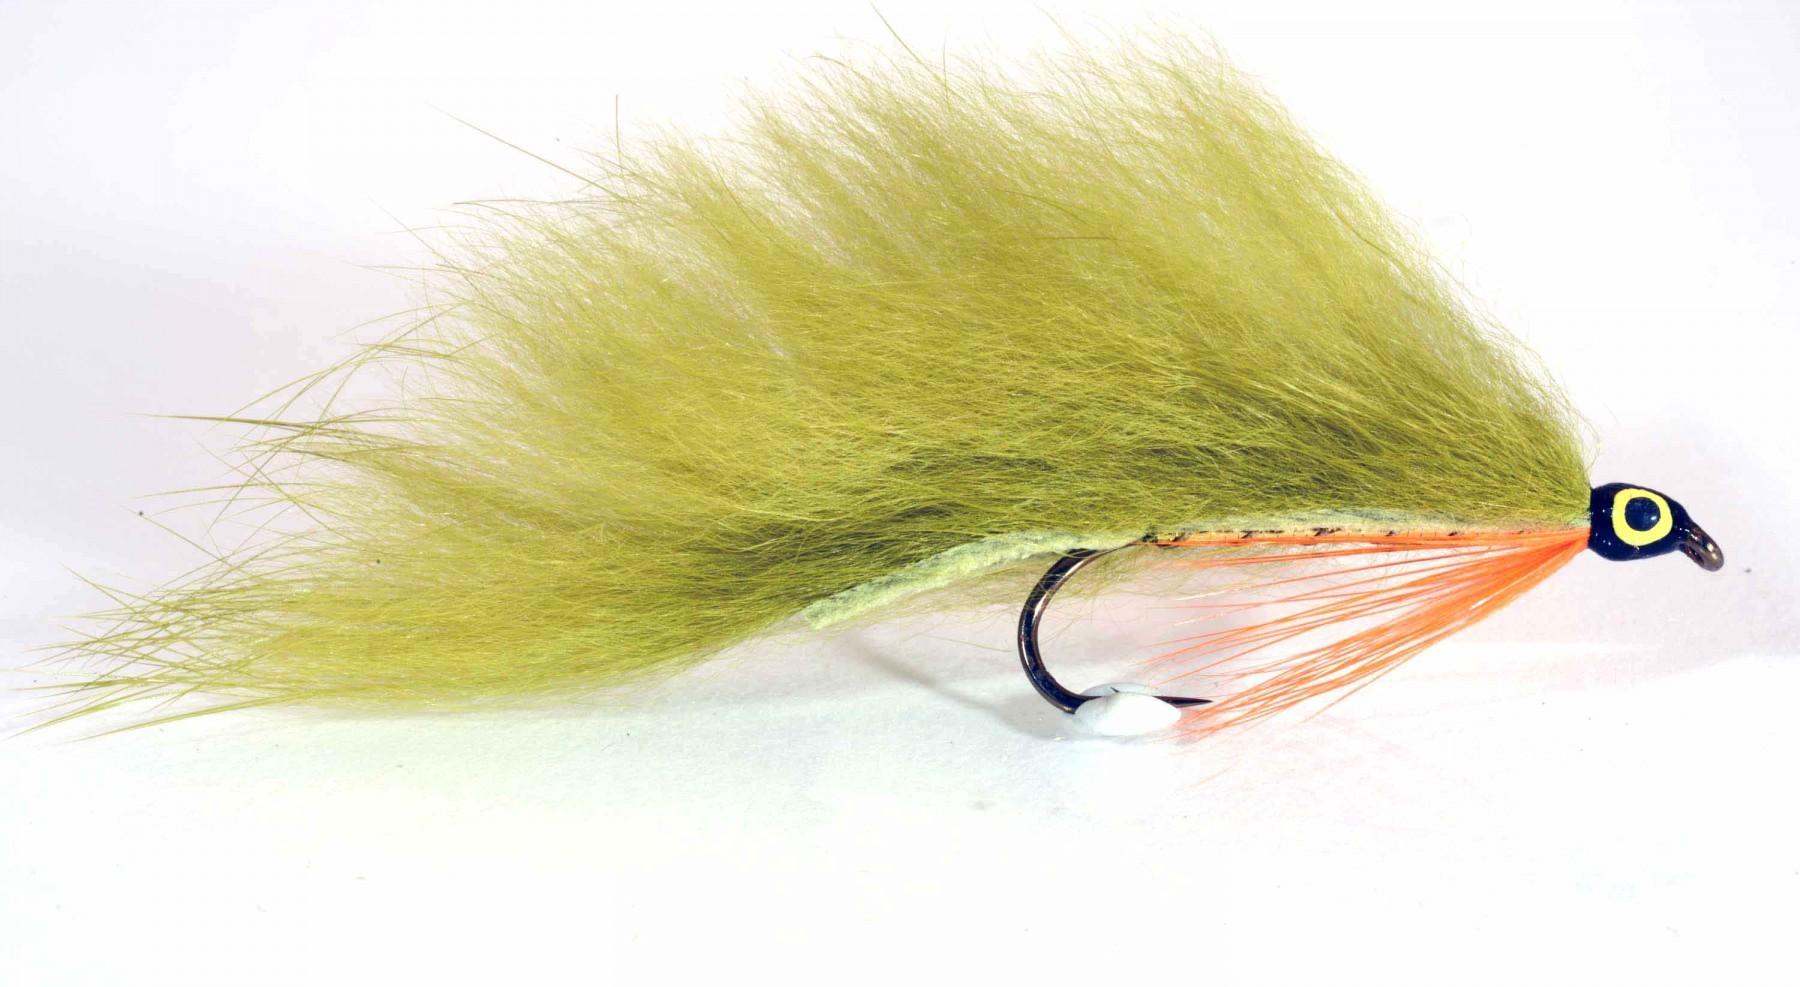 10 x Paternoster Sea System-Beifänger-COD Fly